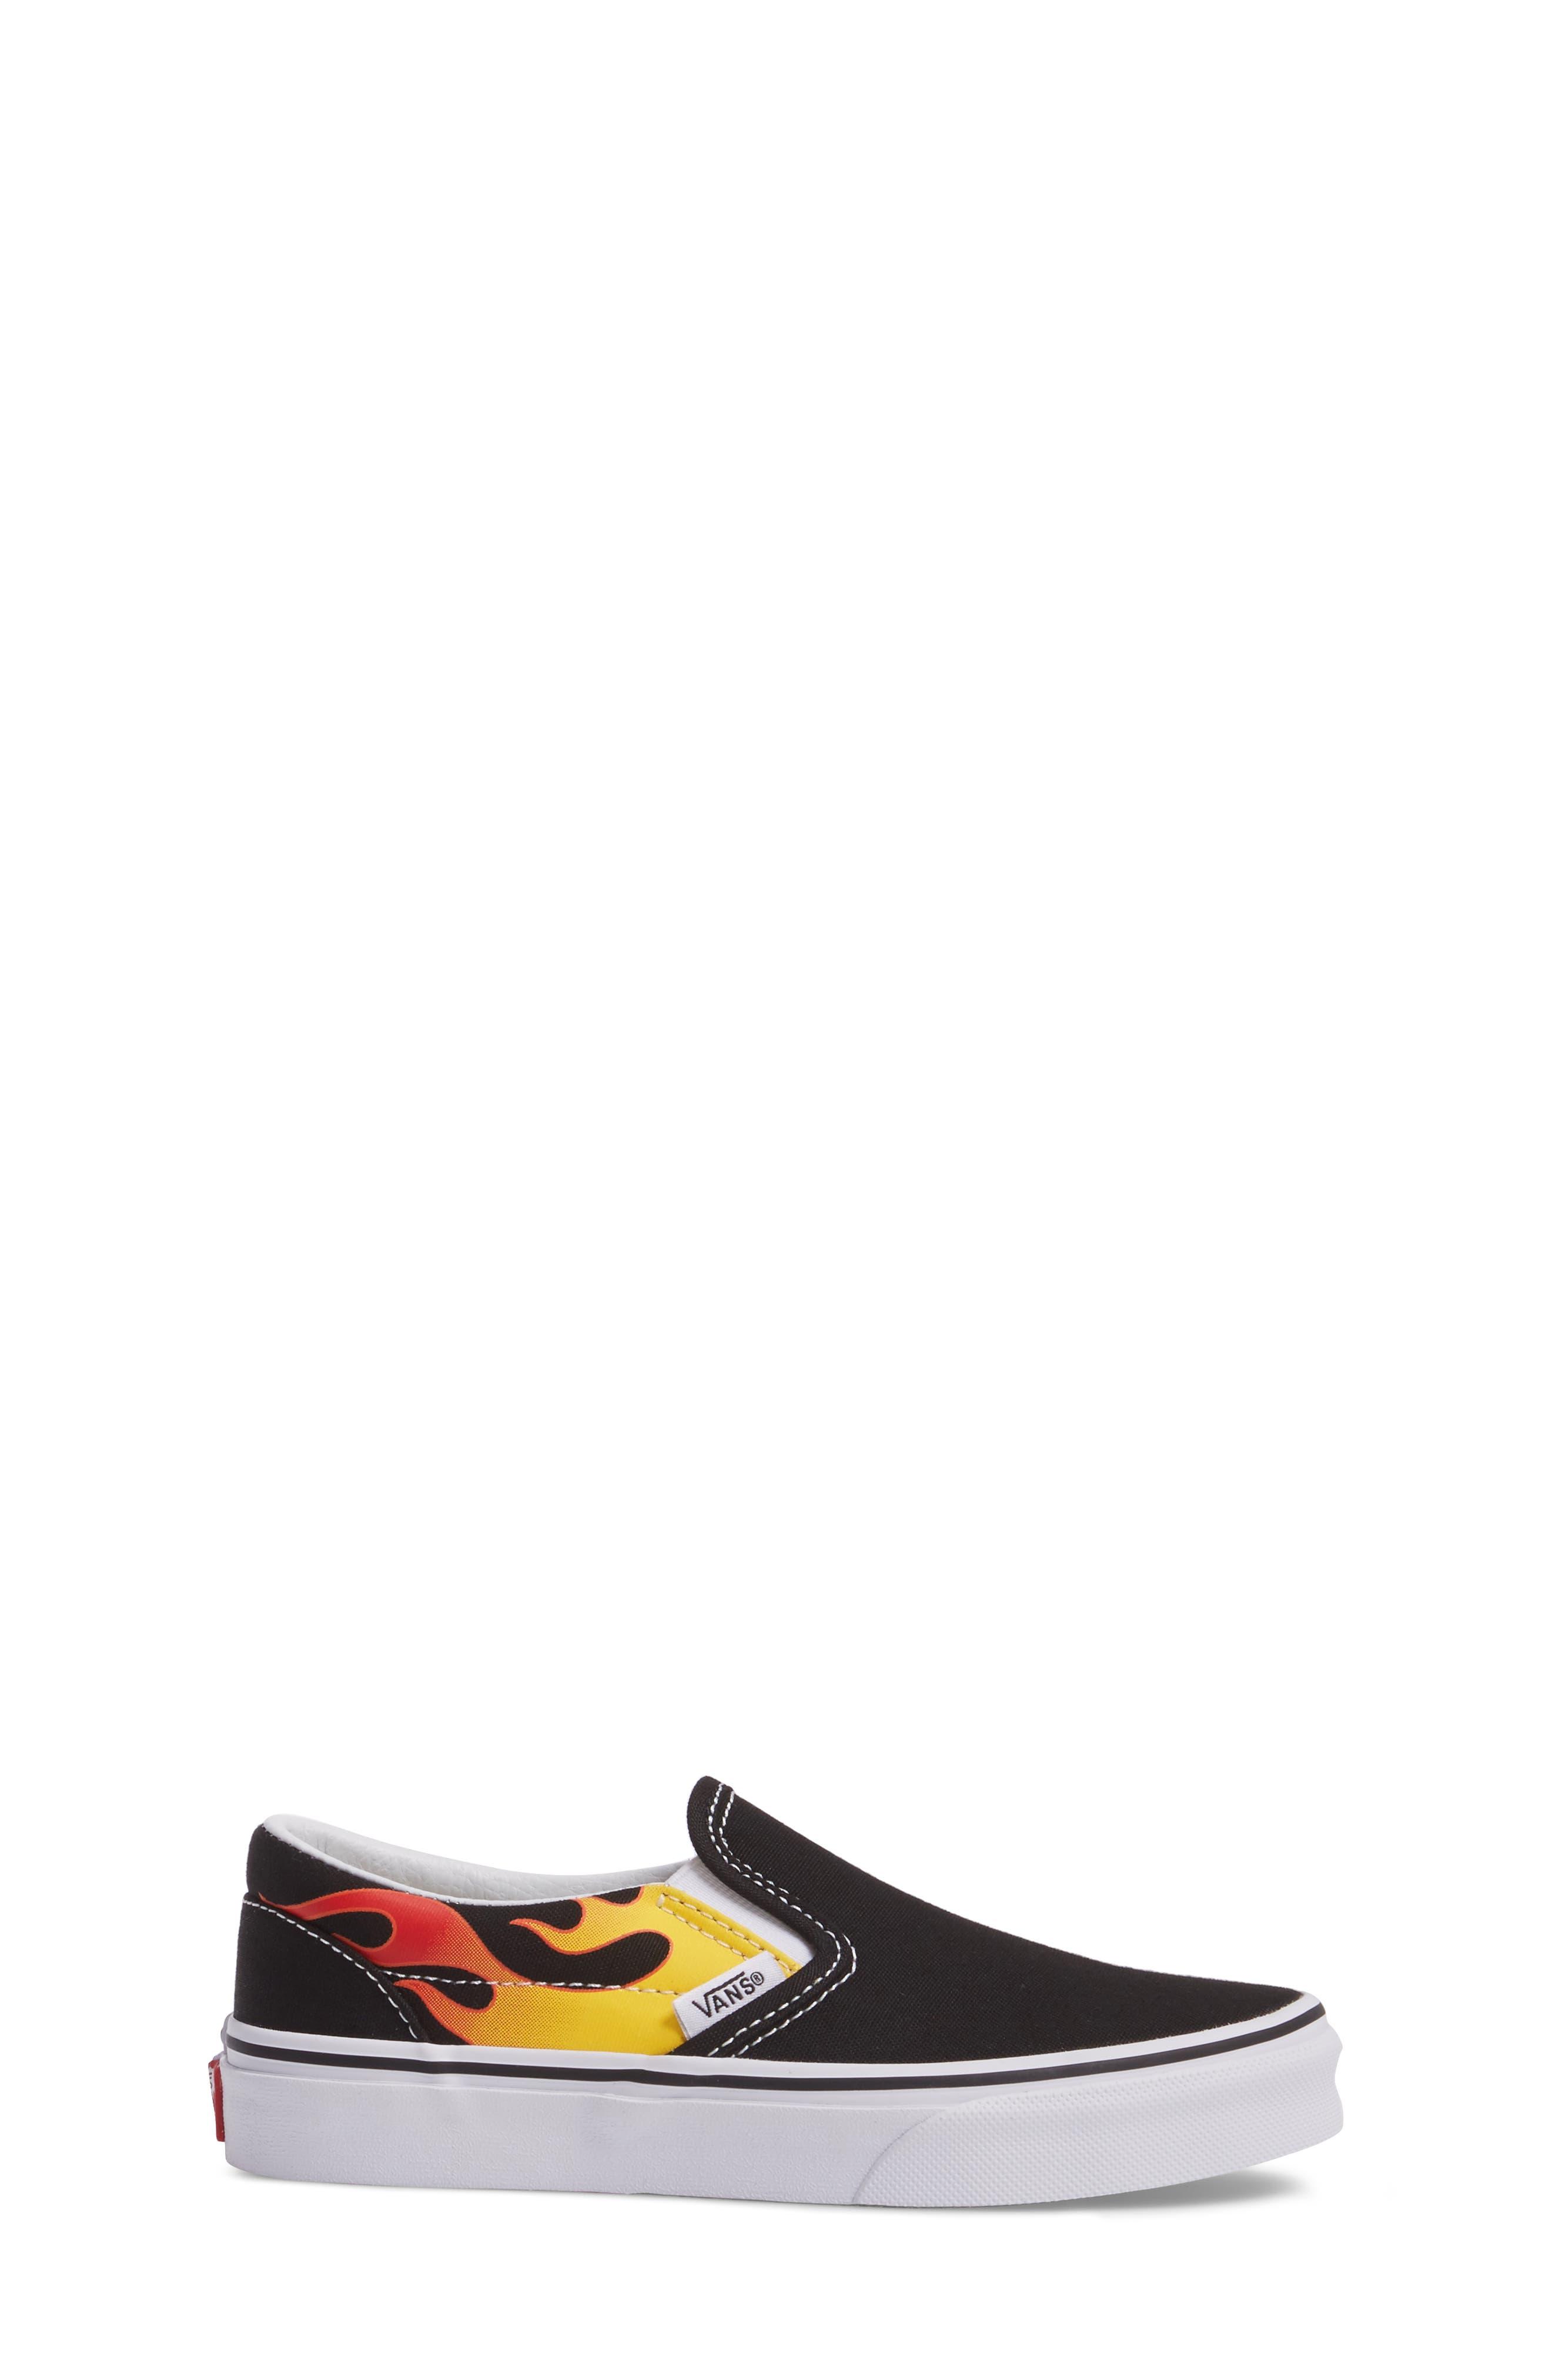 Flame Classic Slip-On Sneaker,                             Alternate thumbnail 3, color,                             002